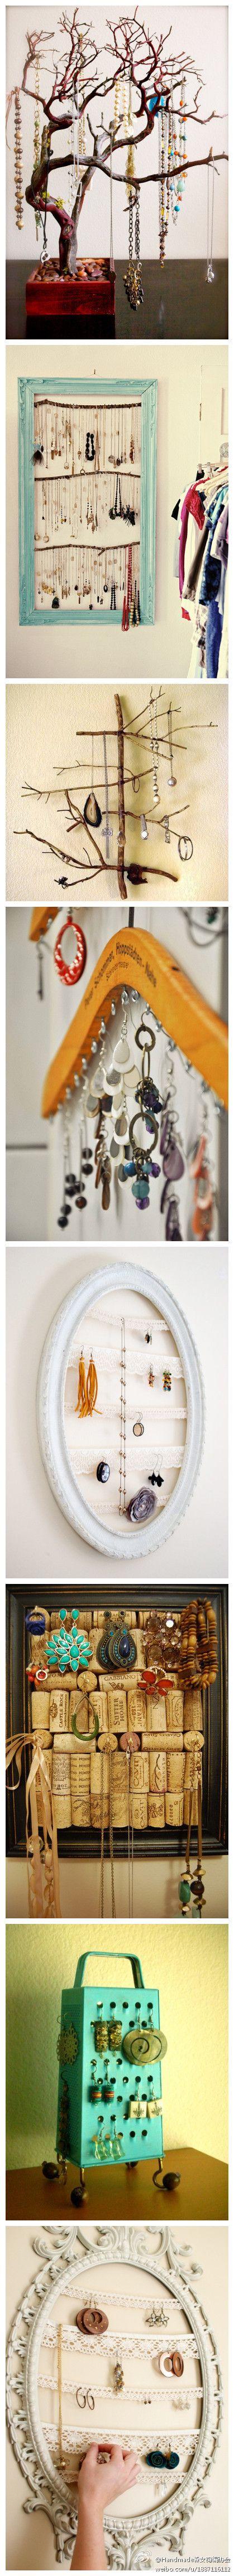 Stylish ways to store jewellery